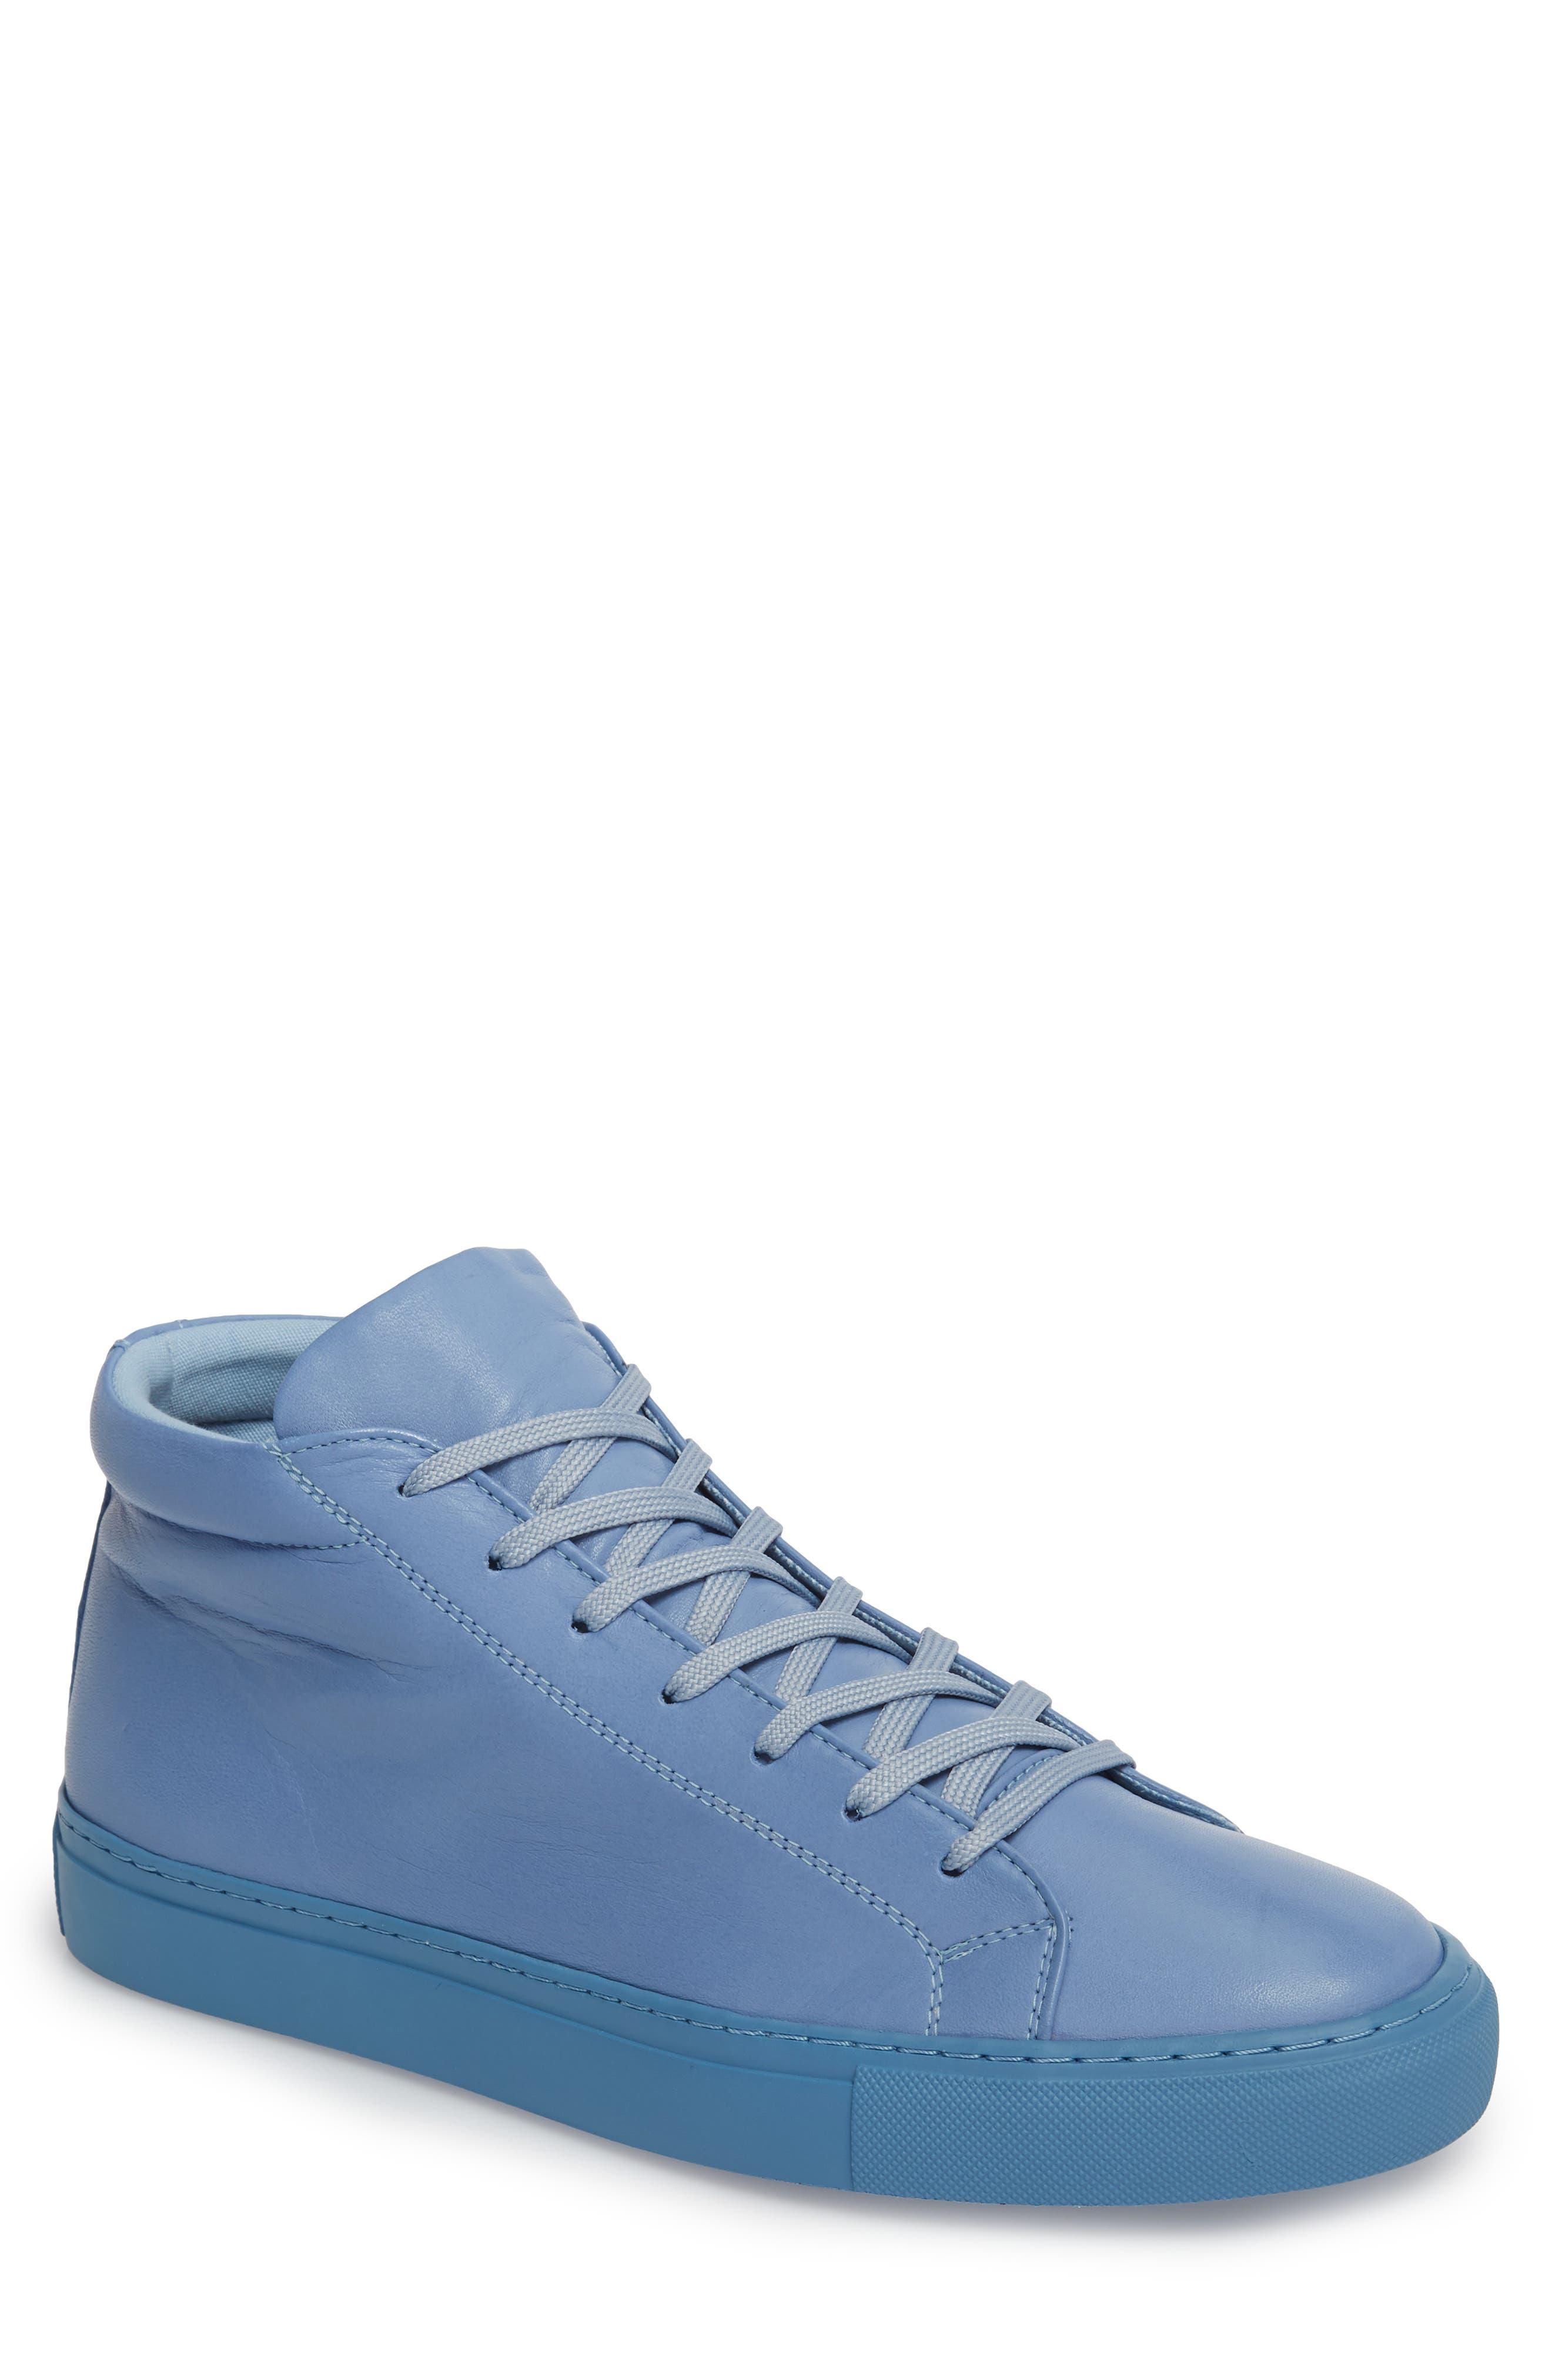 Lexington Mid Top Sneaker,                             Main thumbnail 2, color,